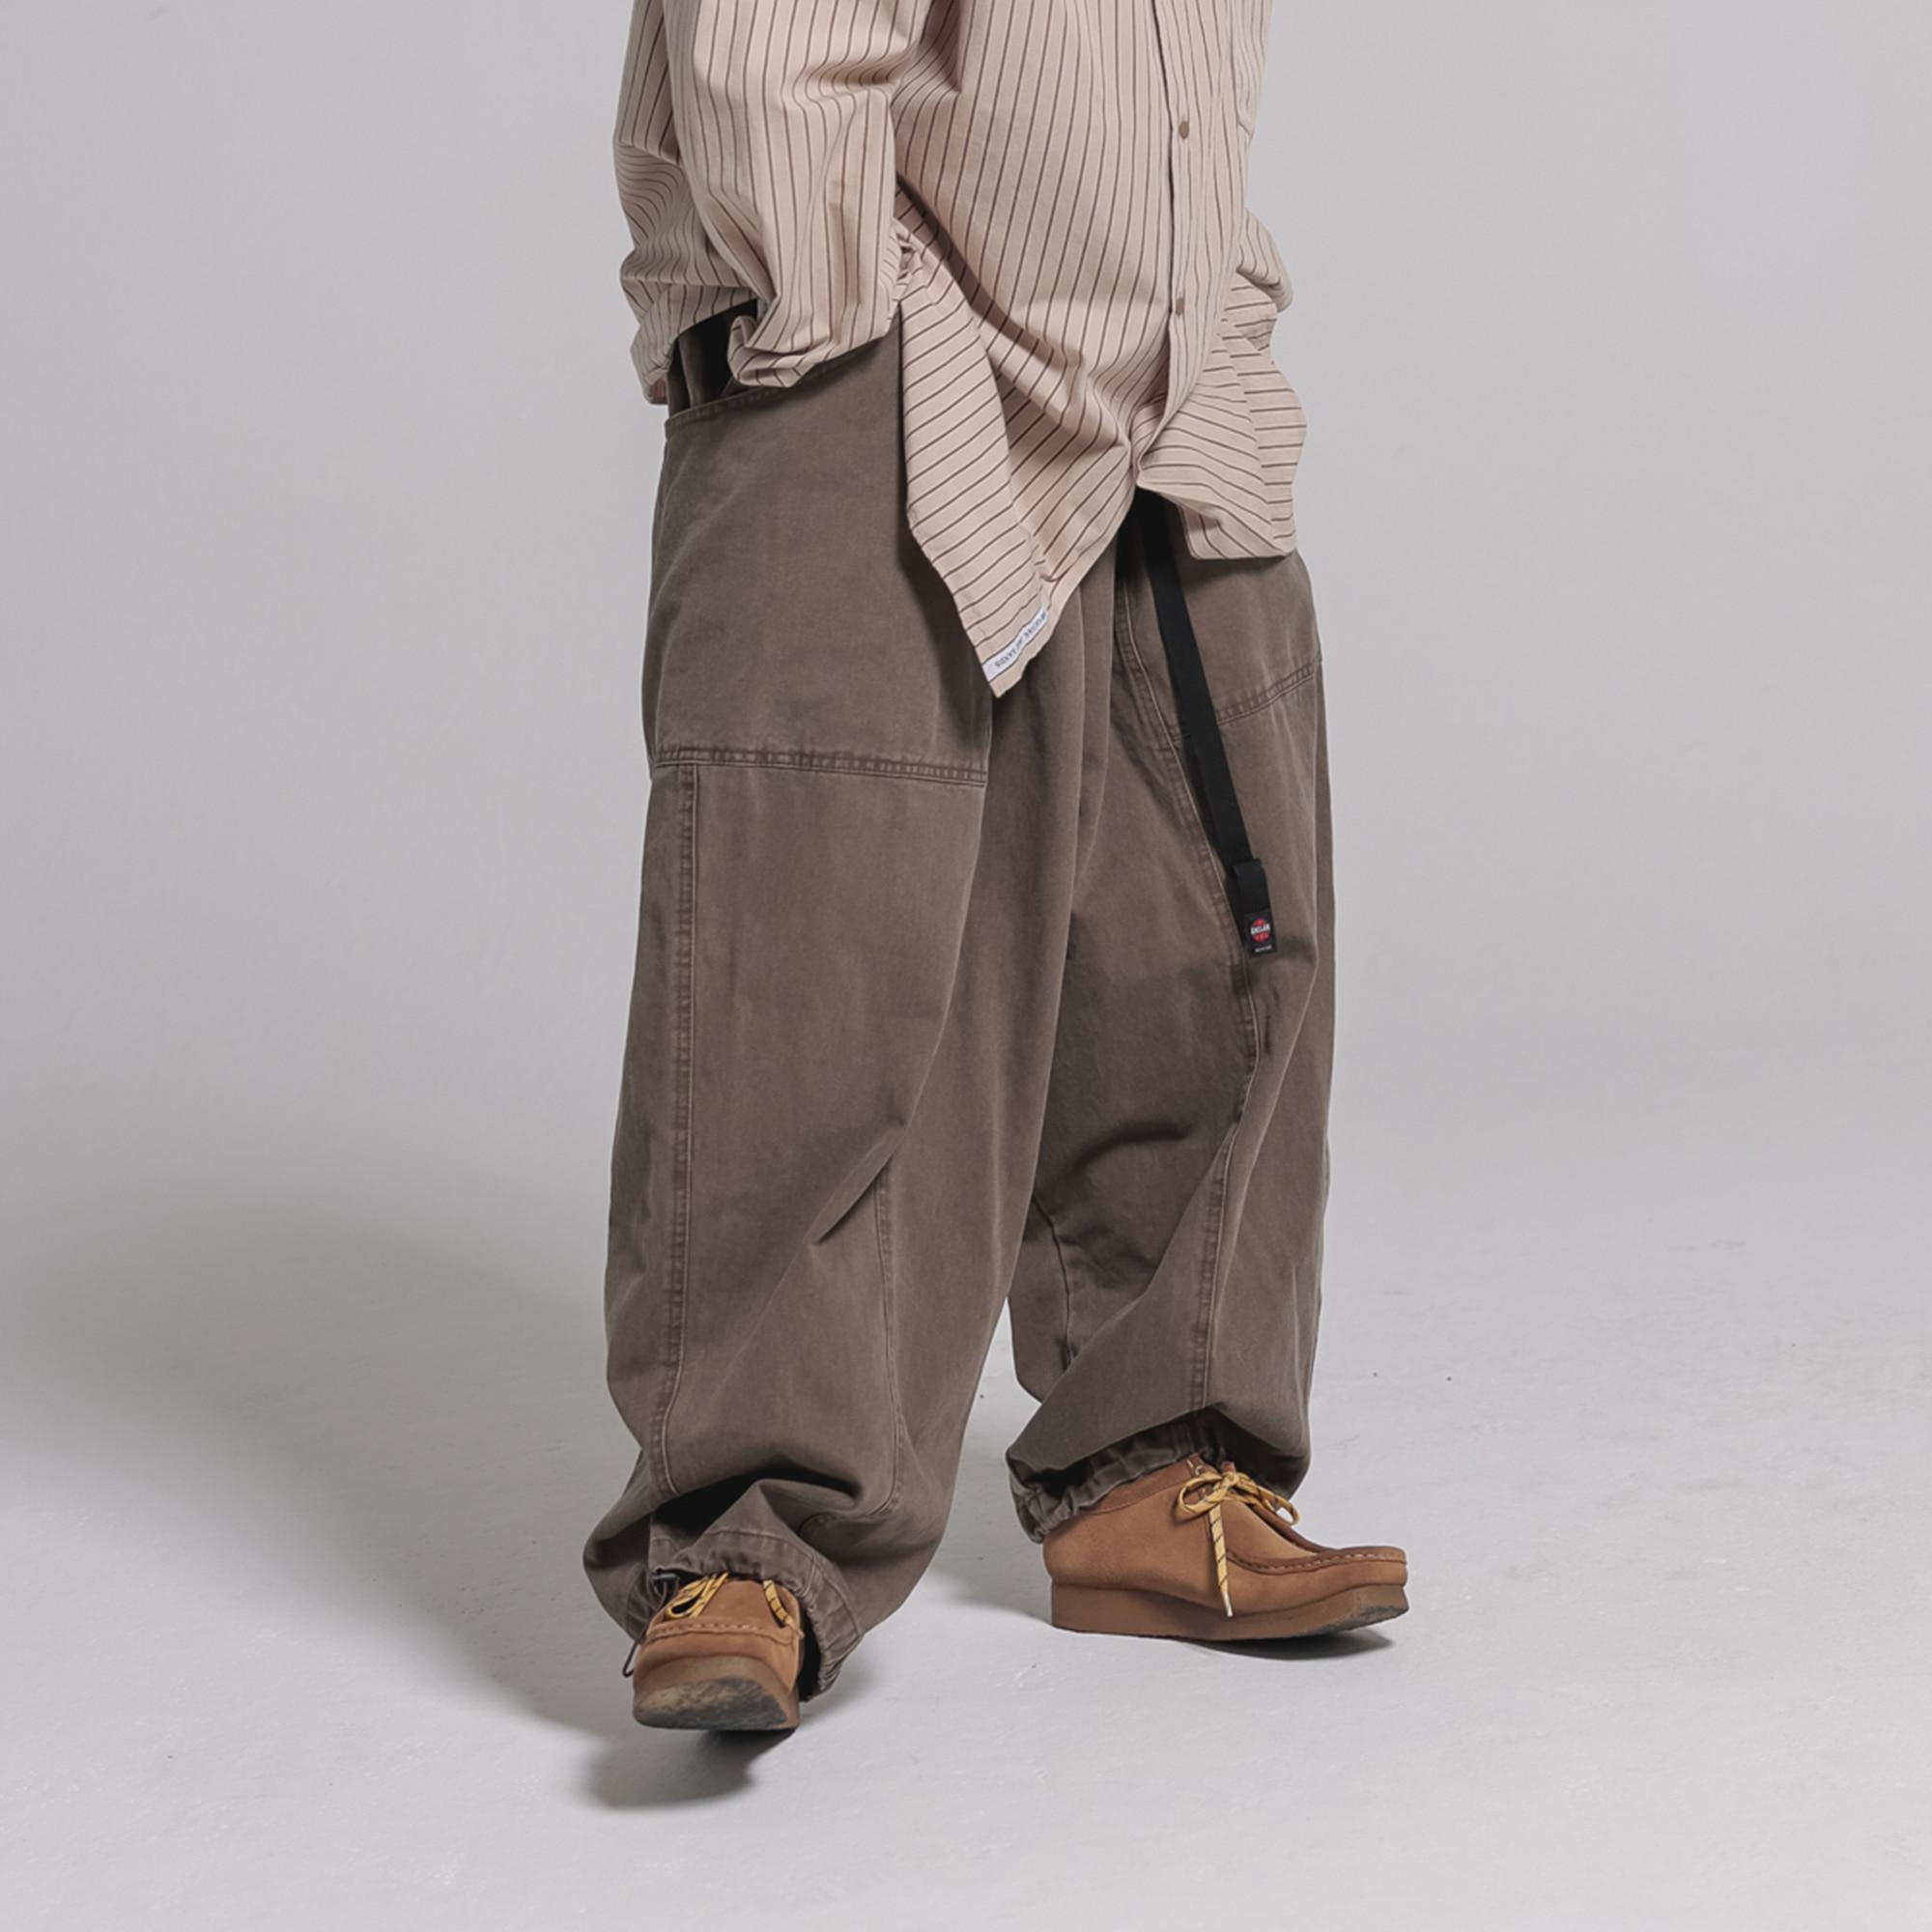 [AG] Layered Pocket Balloon Pants - Brown